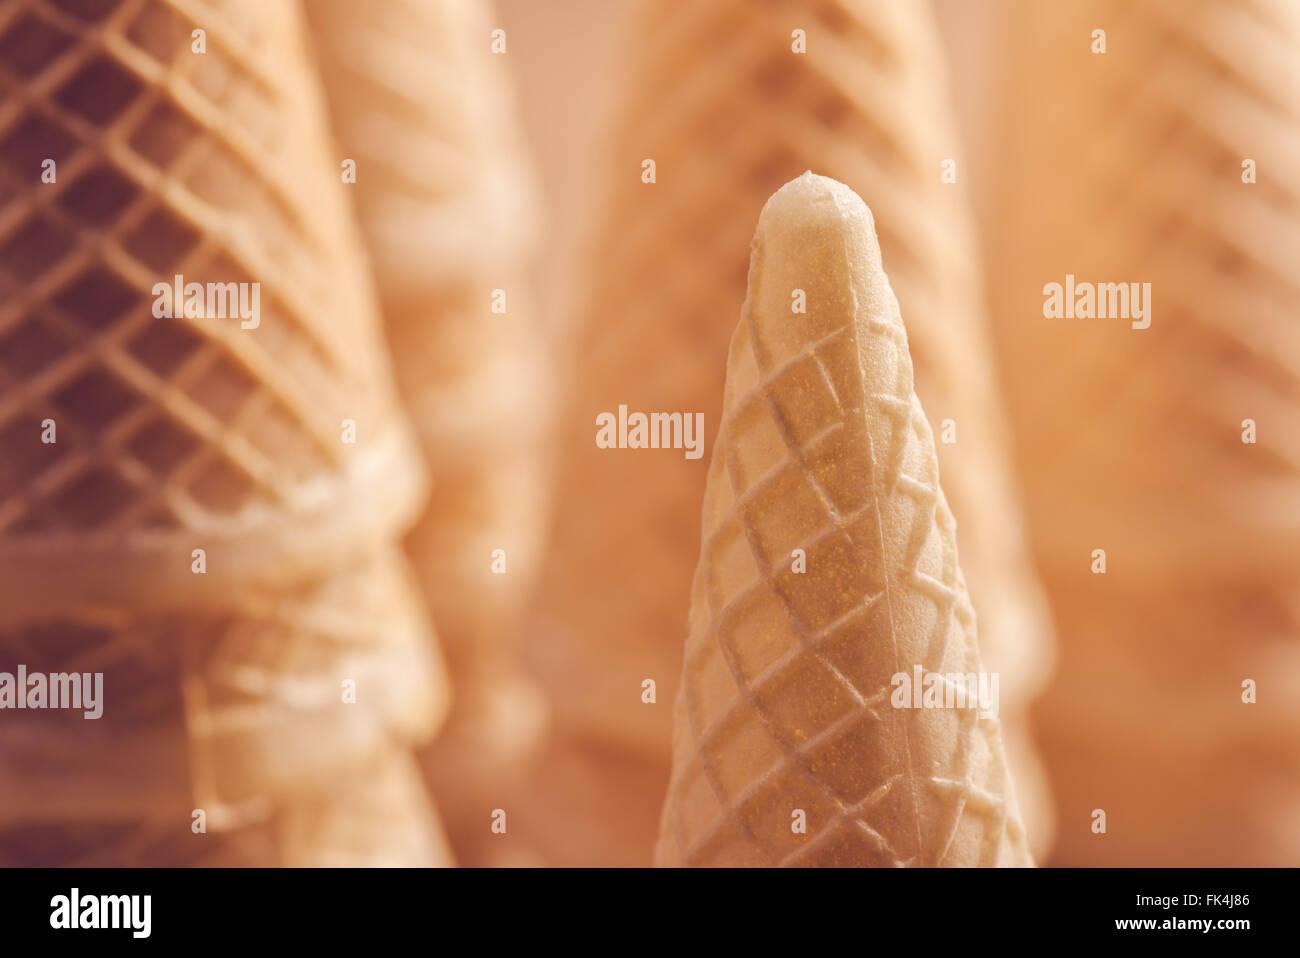 Crispy ice cream cone stack macro detail, warm retro tone, soft light - Stock Image